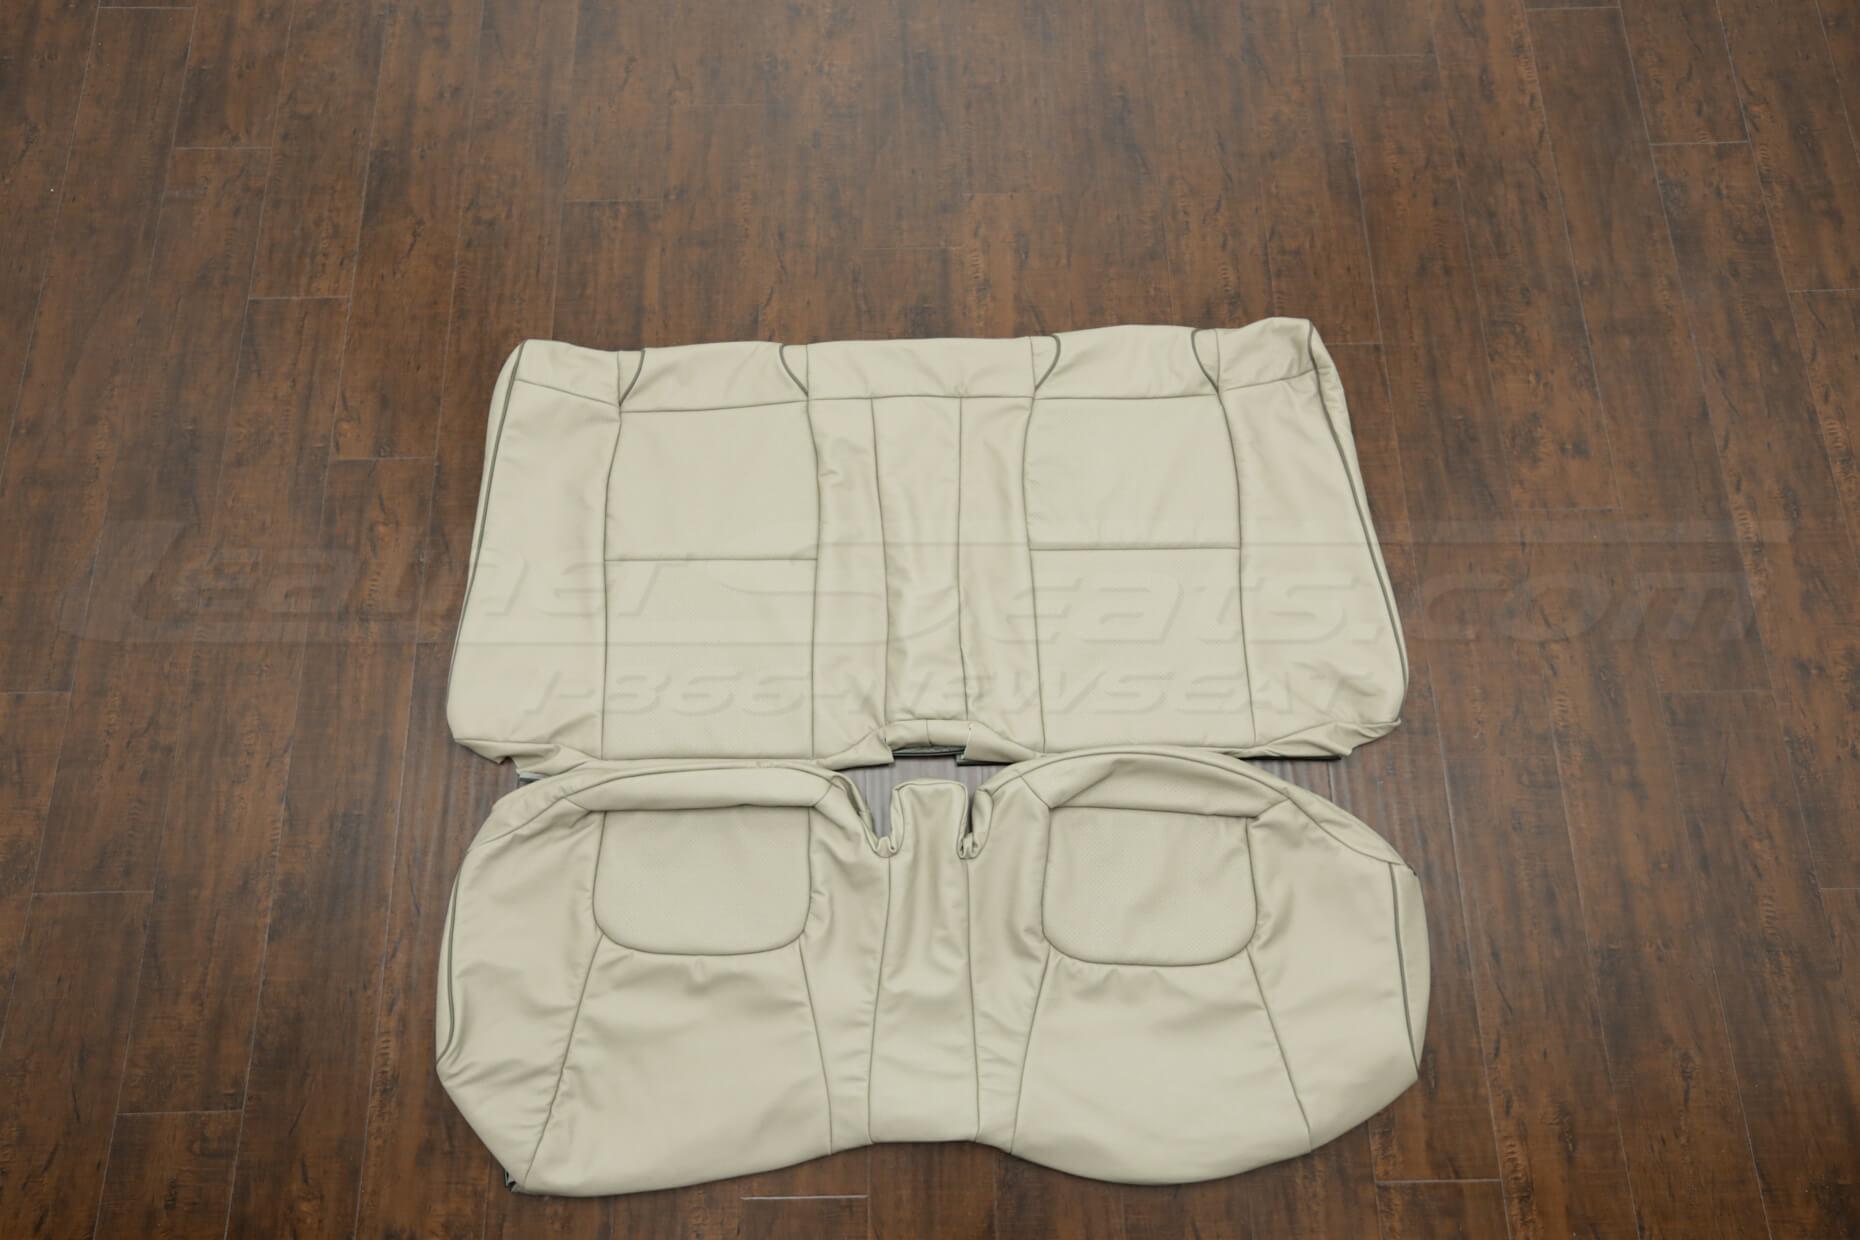 Lexus SC Upholstery Kit - Ivory - Rear seats